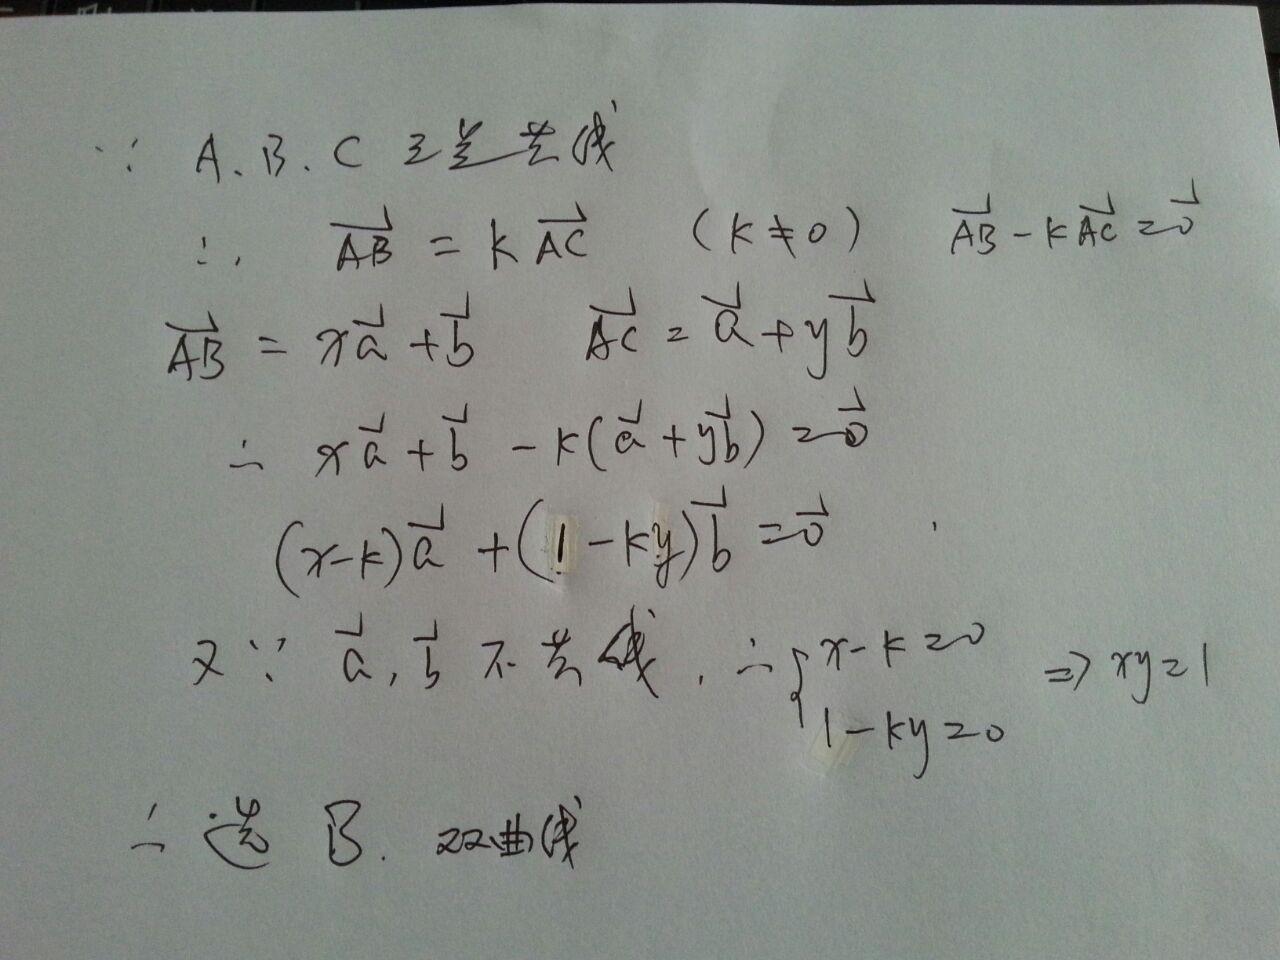 向量=向量+向量向量c=向量+y向量